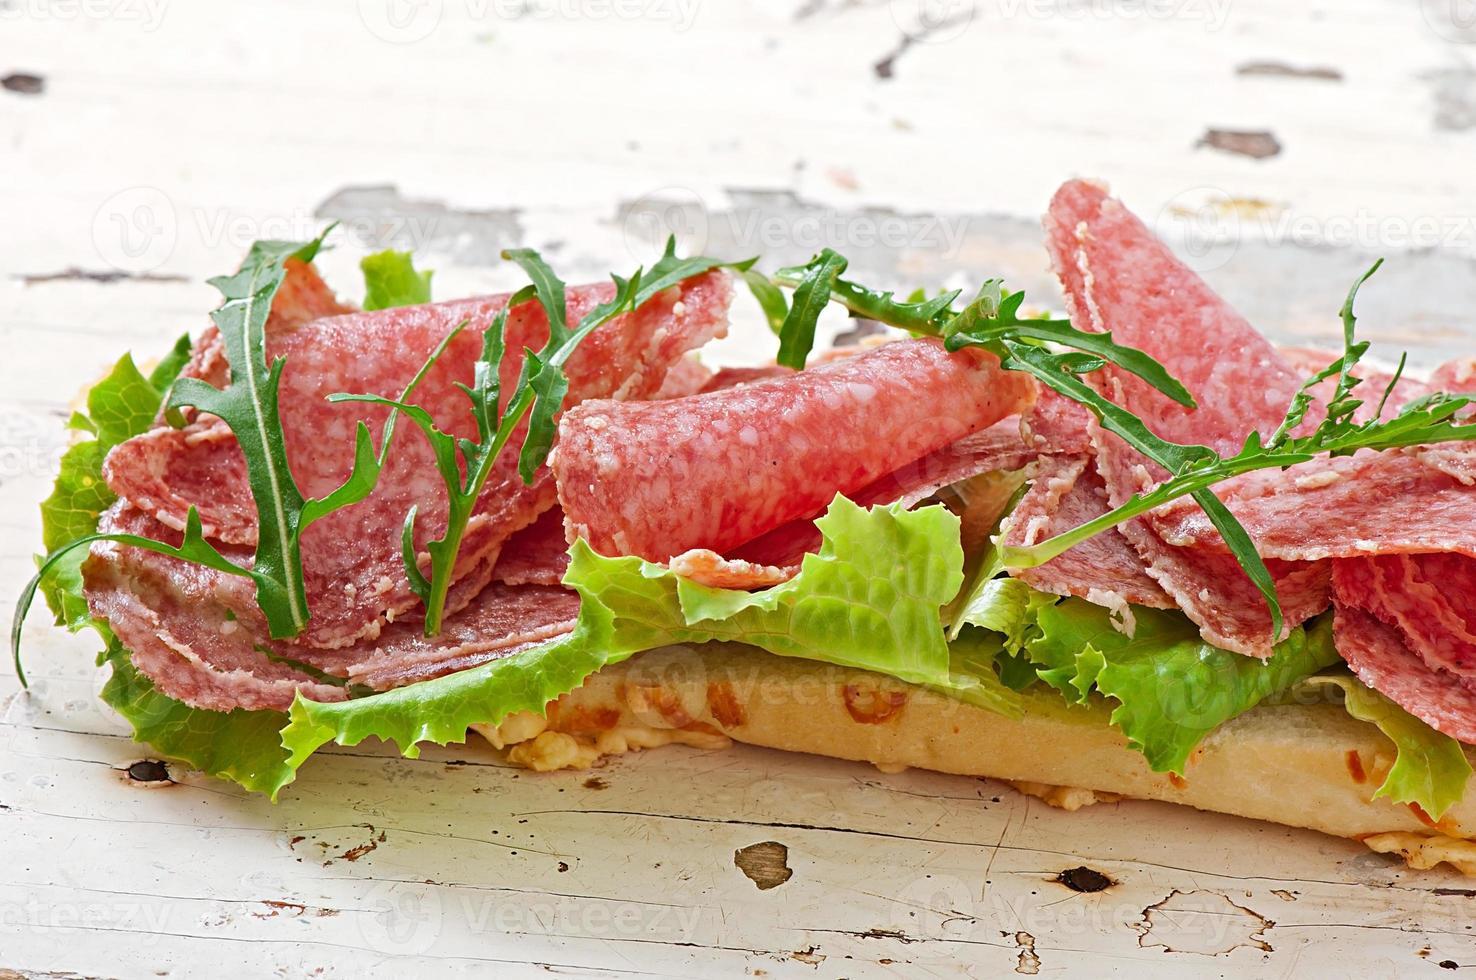 Big sandwich with salami, lettuce and arugula photo